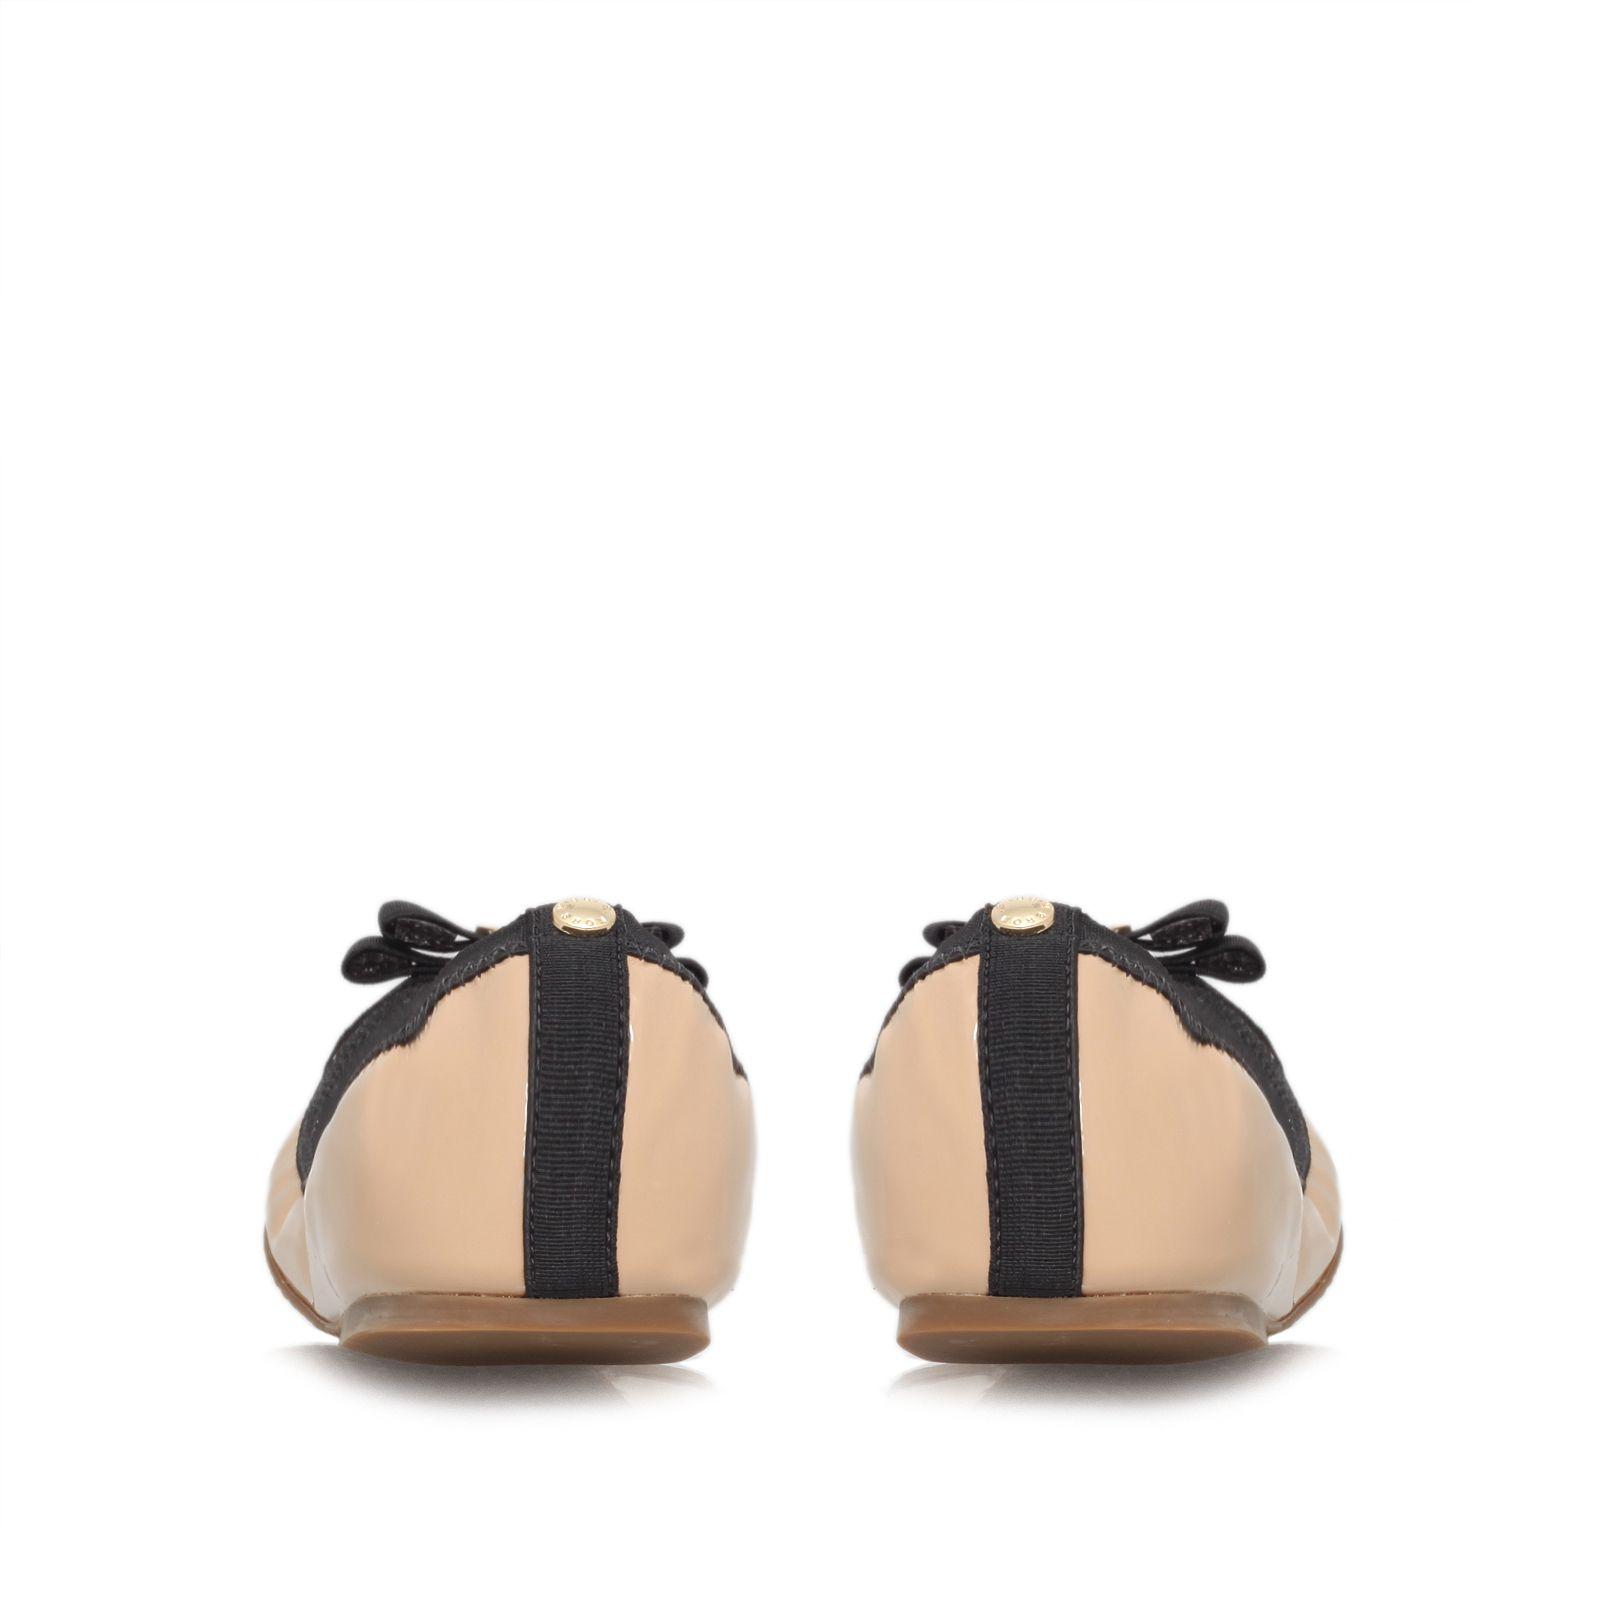 michael kors ballerina schwarz michael kors ramsey. Black Bedroom Furniture Sets. Home Design Ideas